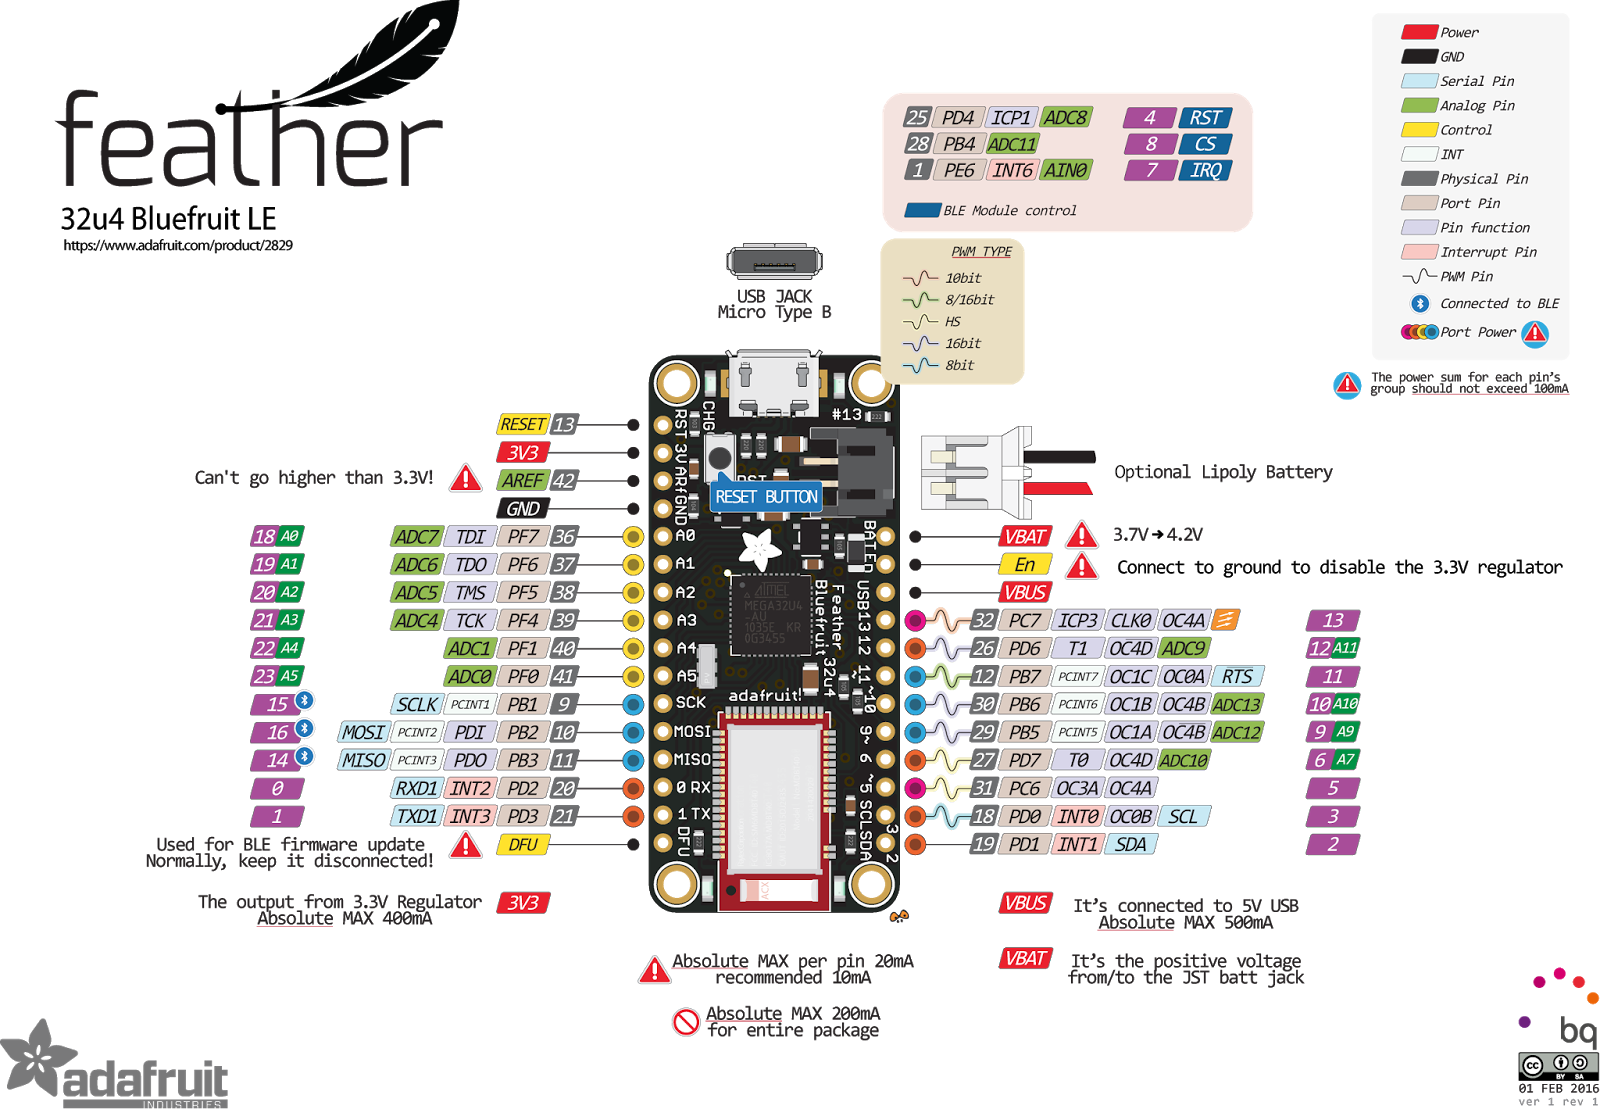 Hardware: Adafruit Feather 32u4 Radio (RFM69HCW) Software